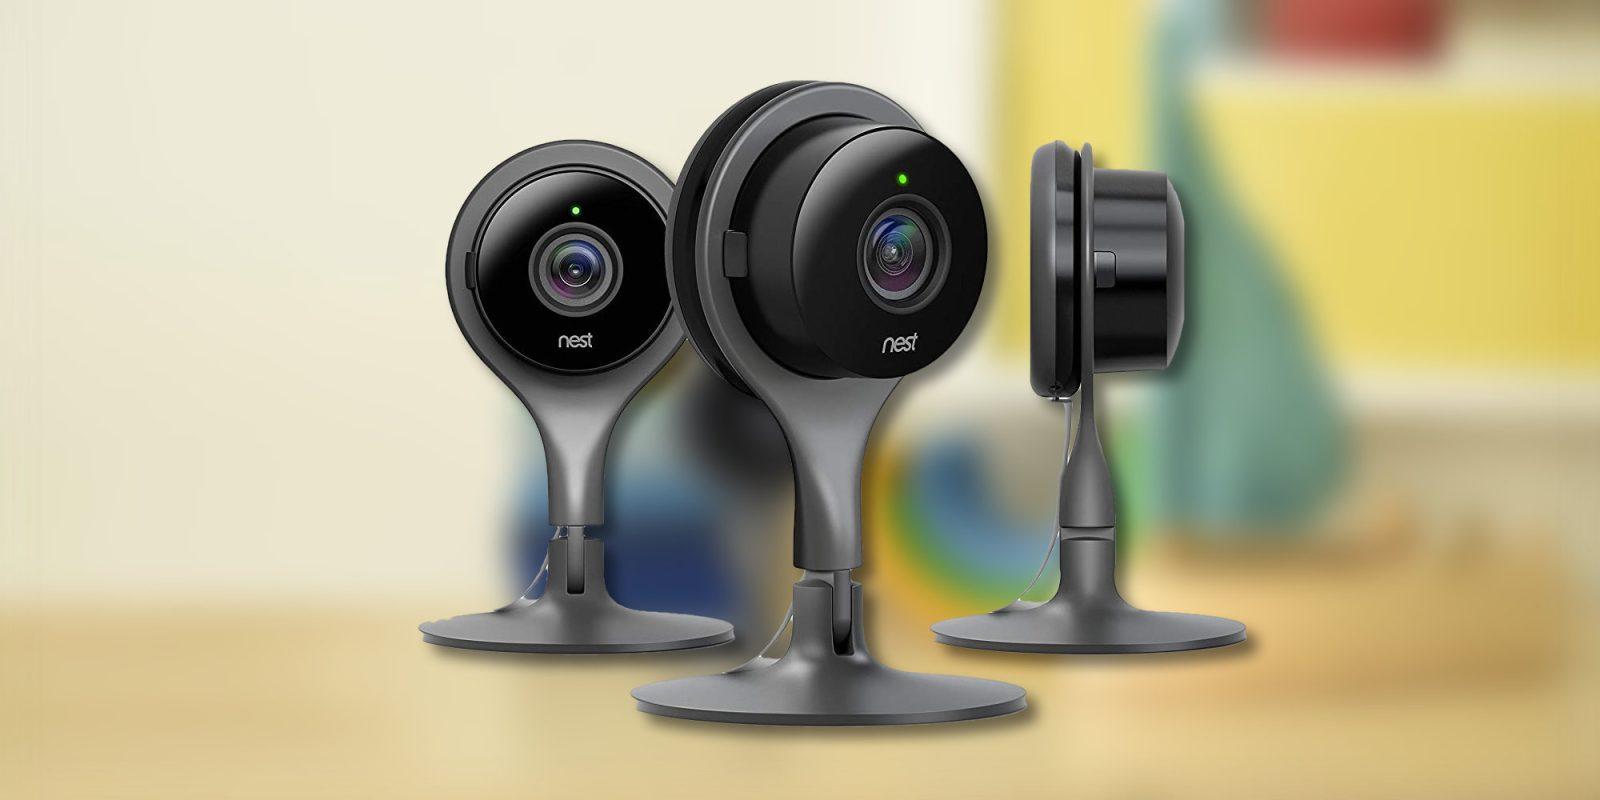 Snatch up three Google Nest Security Cameras for $316 50